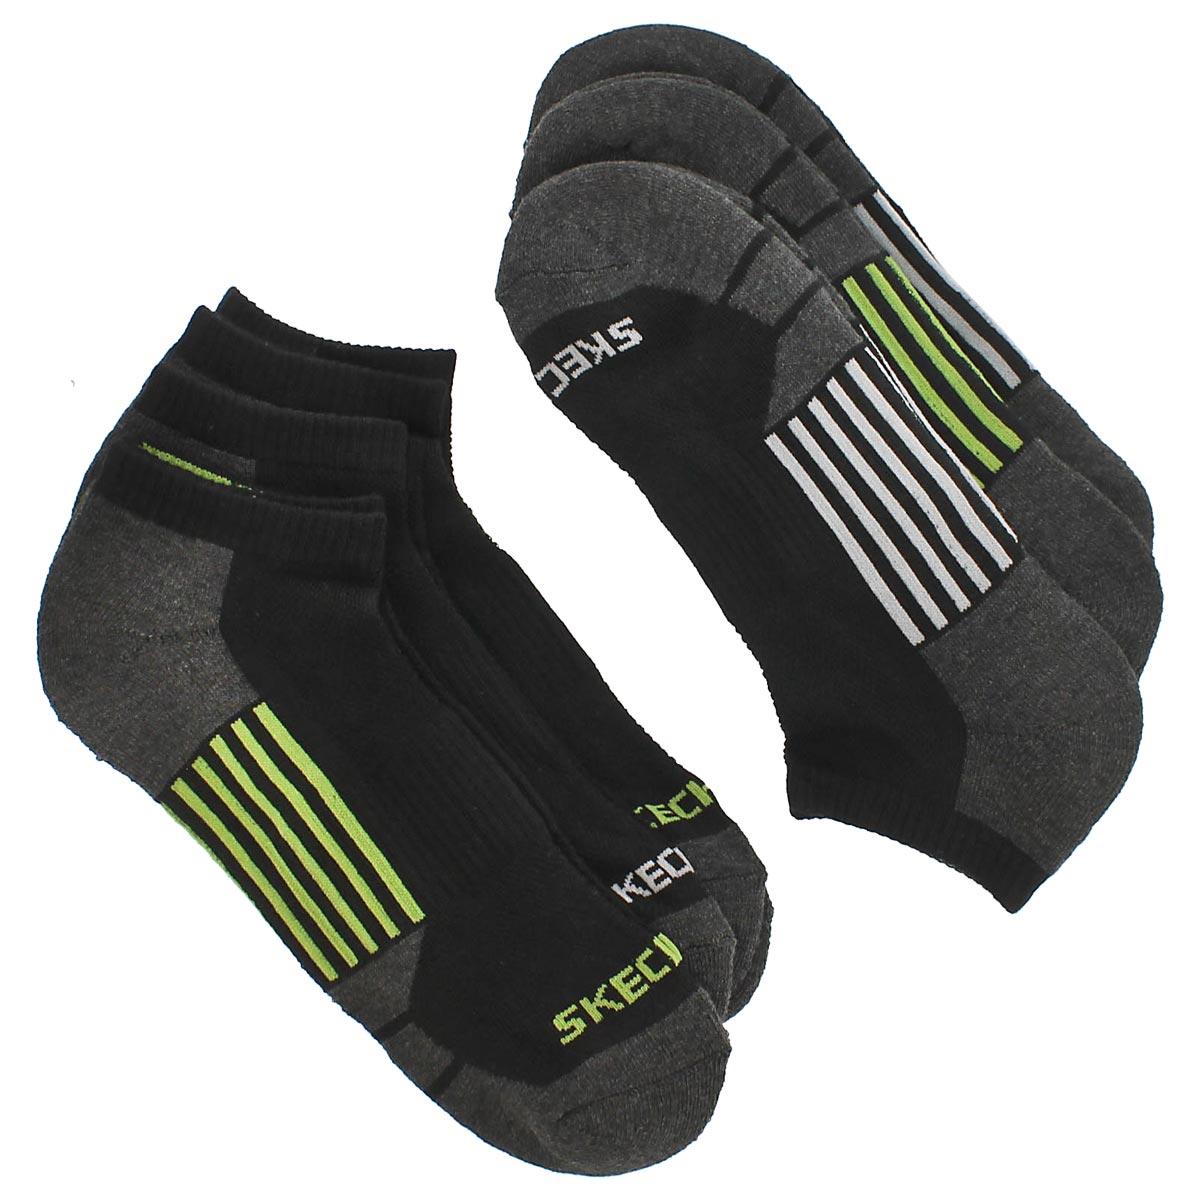 Mns 1/2 Terry Crew blk/grn socks 6pk